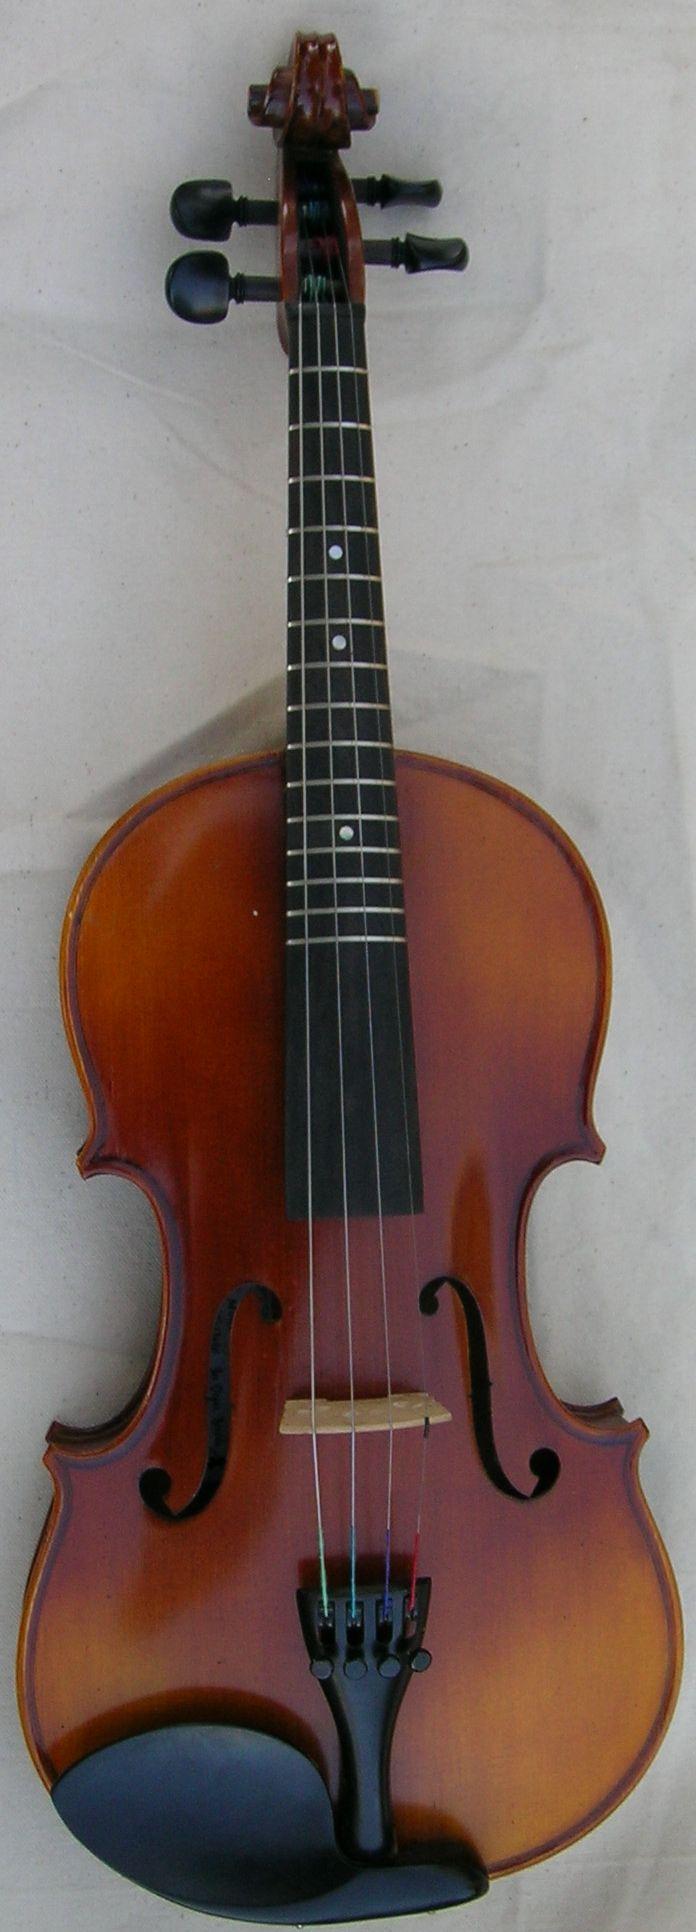 Salvatore Cadoni Fretted Acoustic Violin